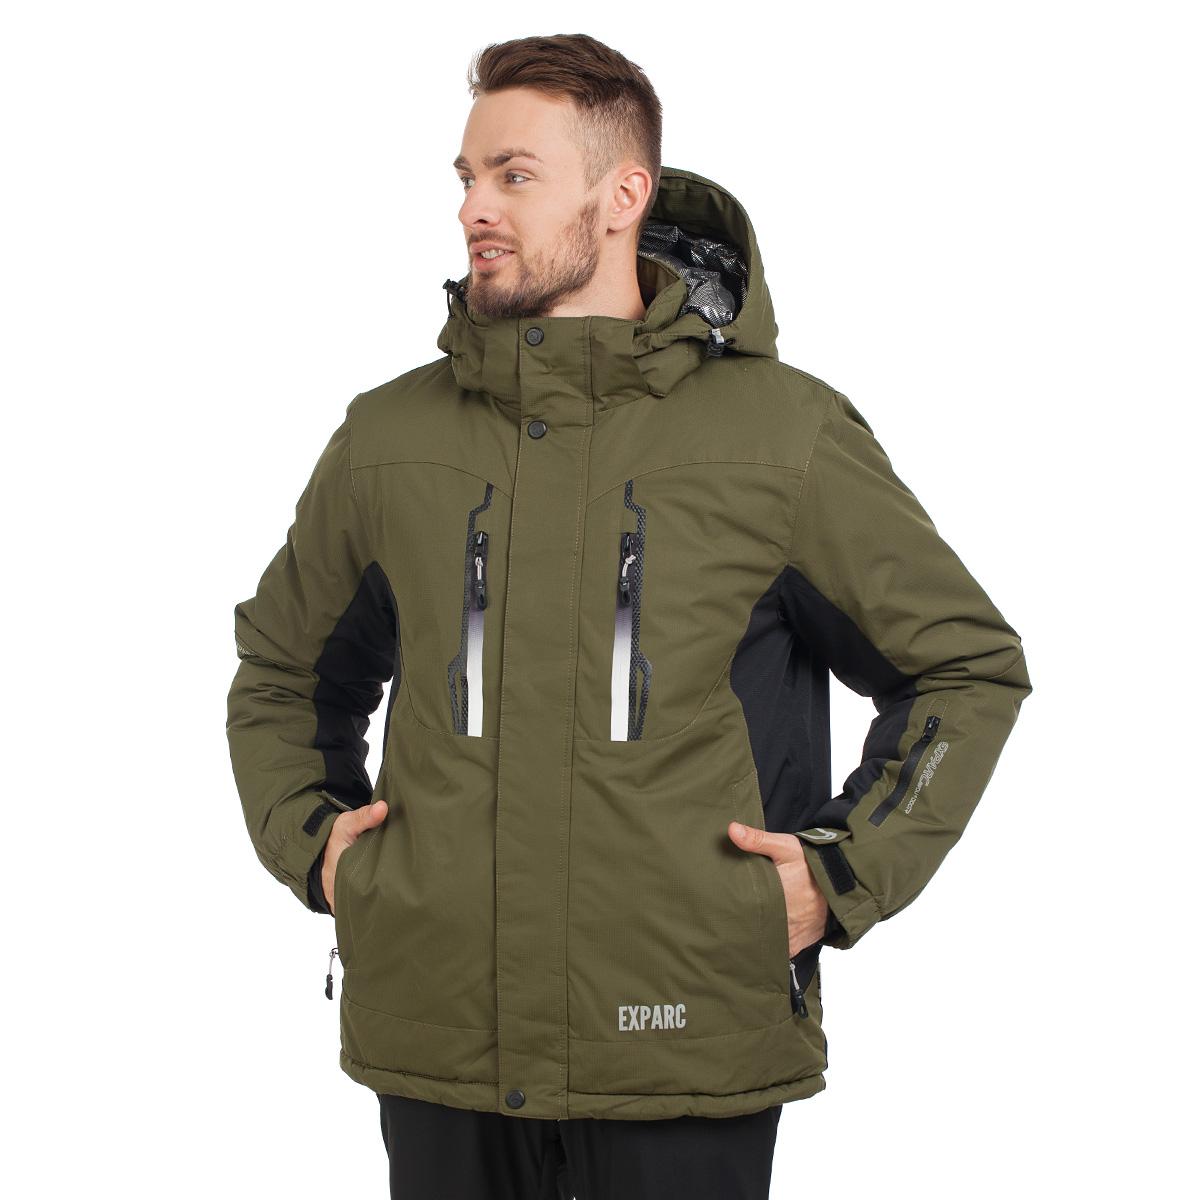 Куртка горнолыжная Exparc, 2026